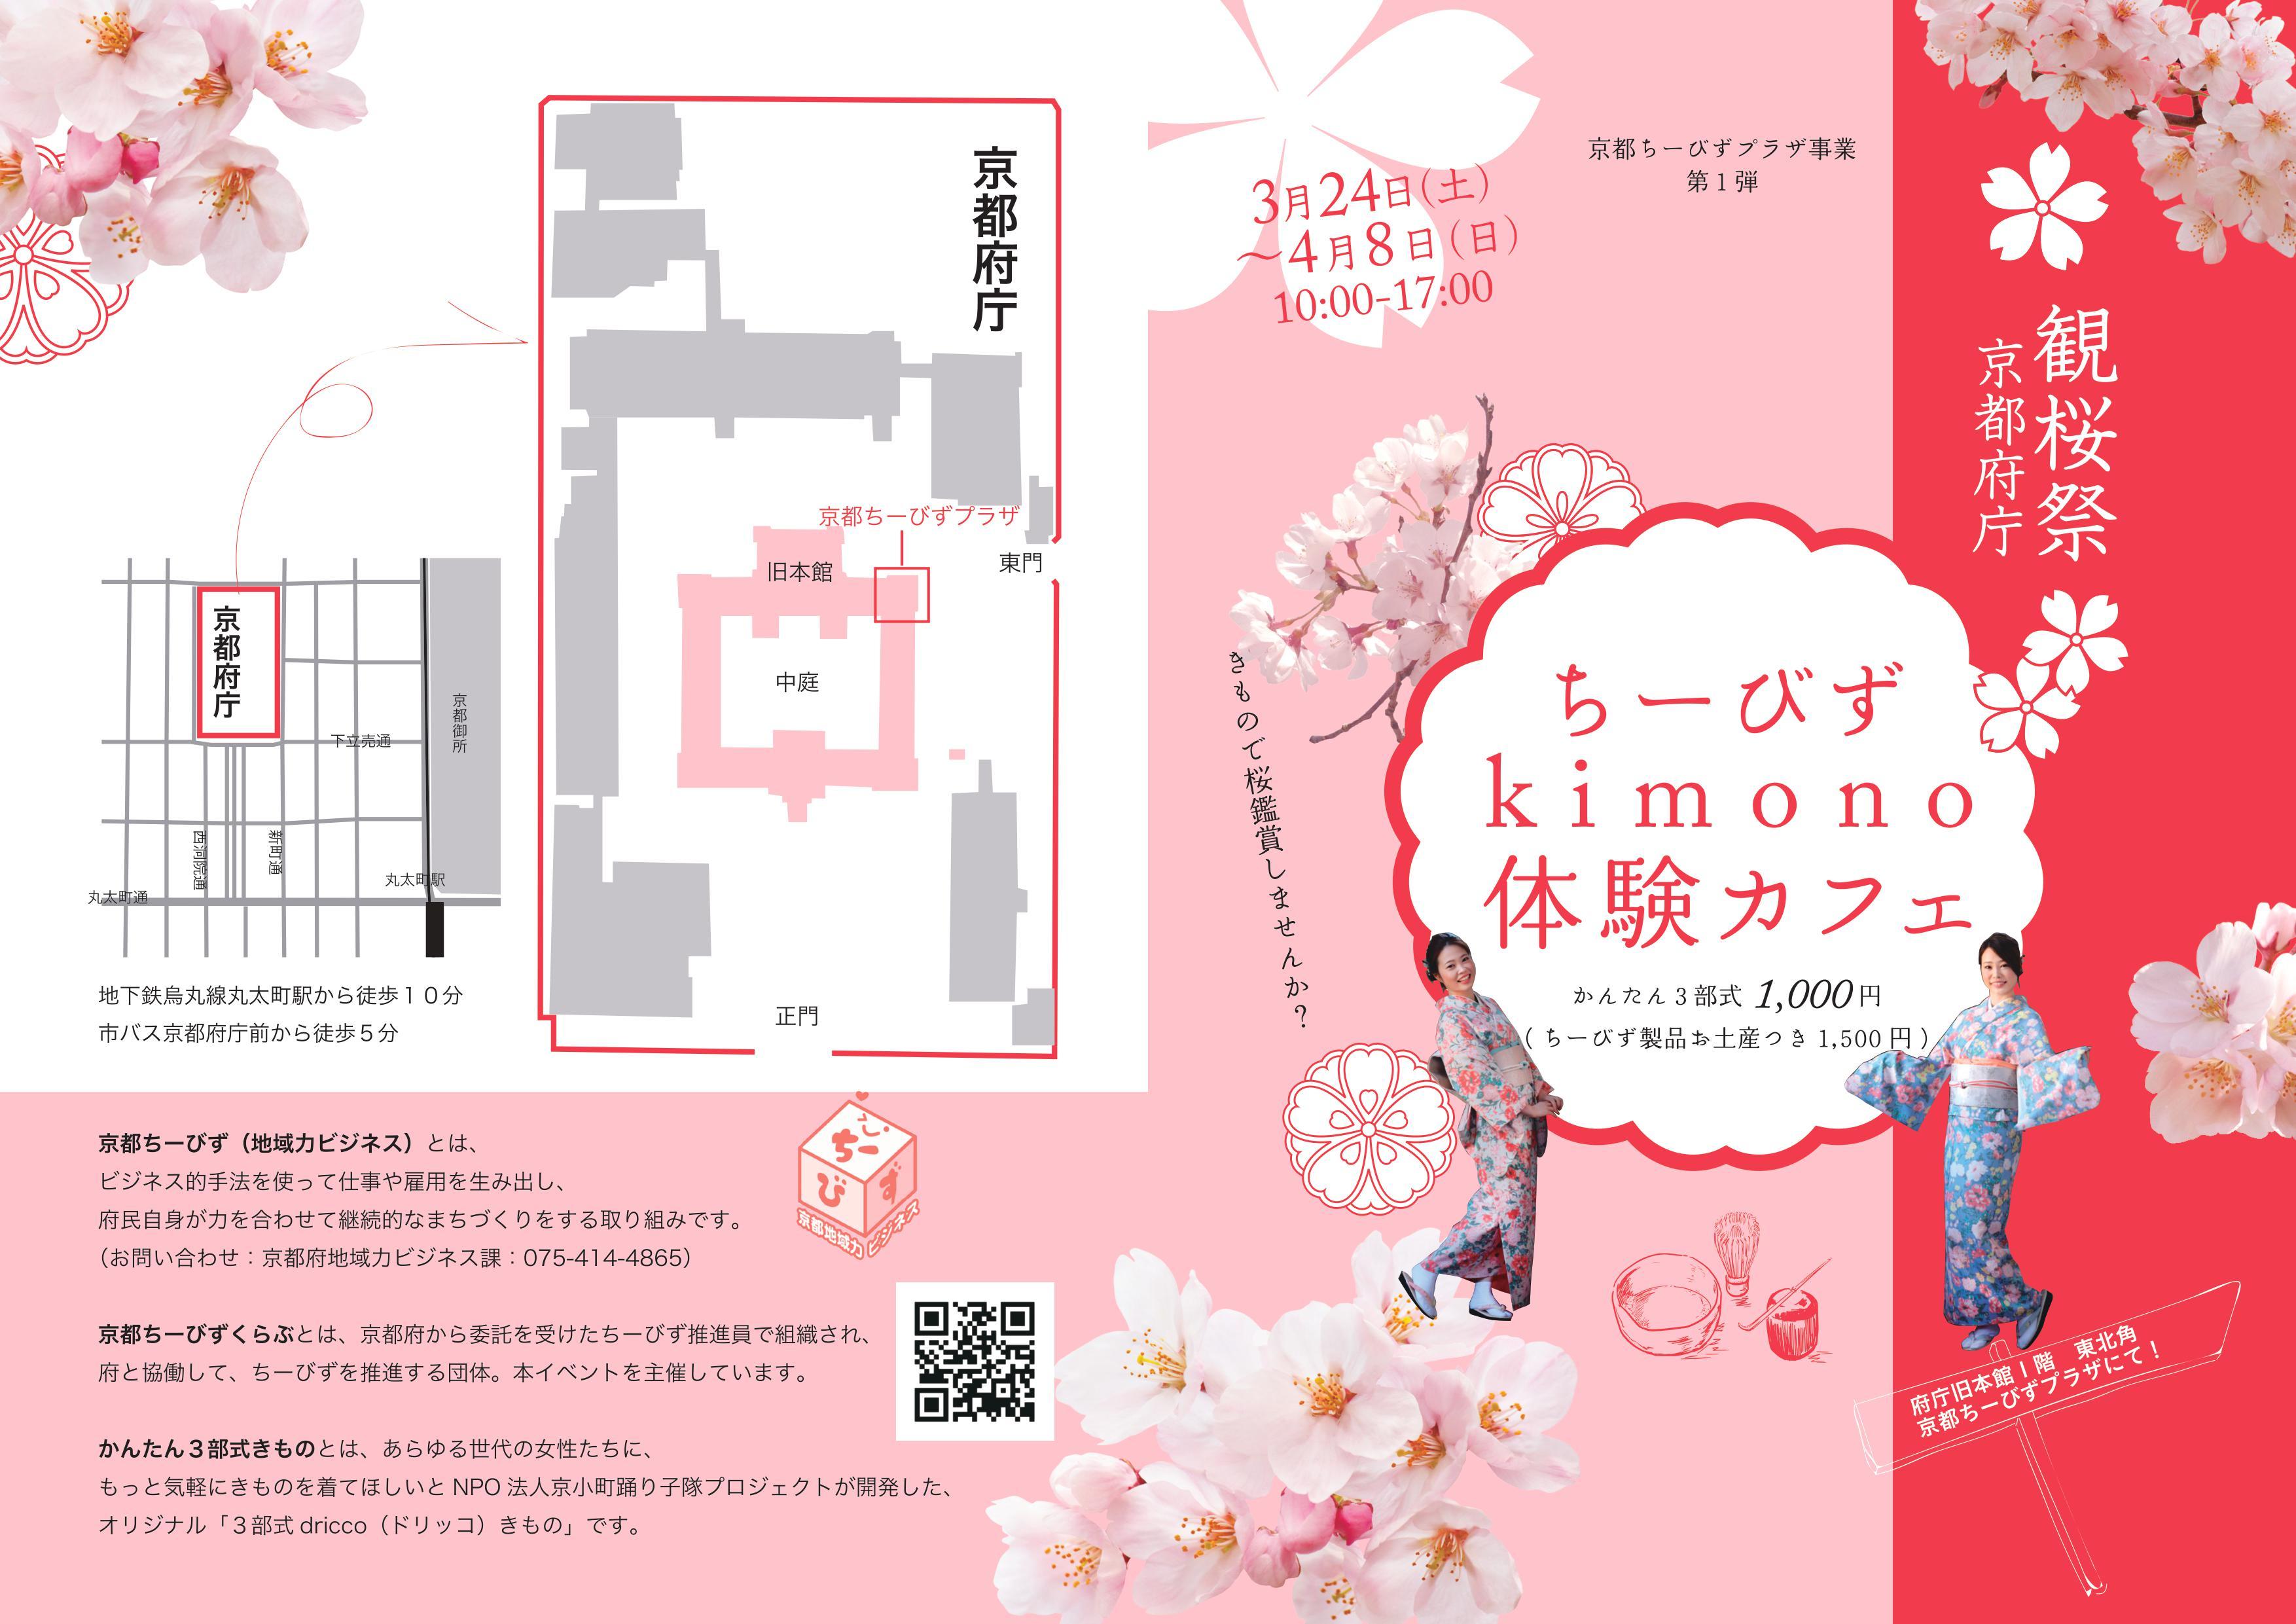 kimono体験カフェ@京都府庁観桜祭